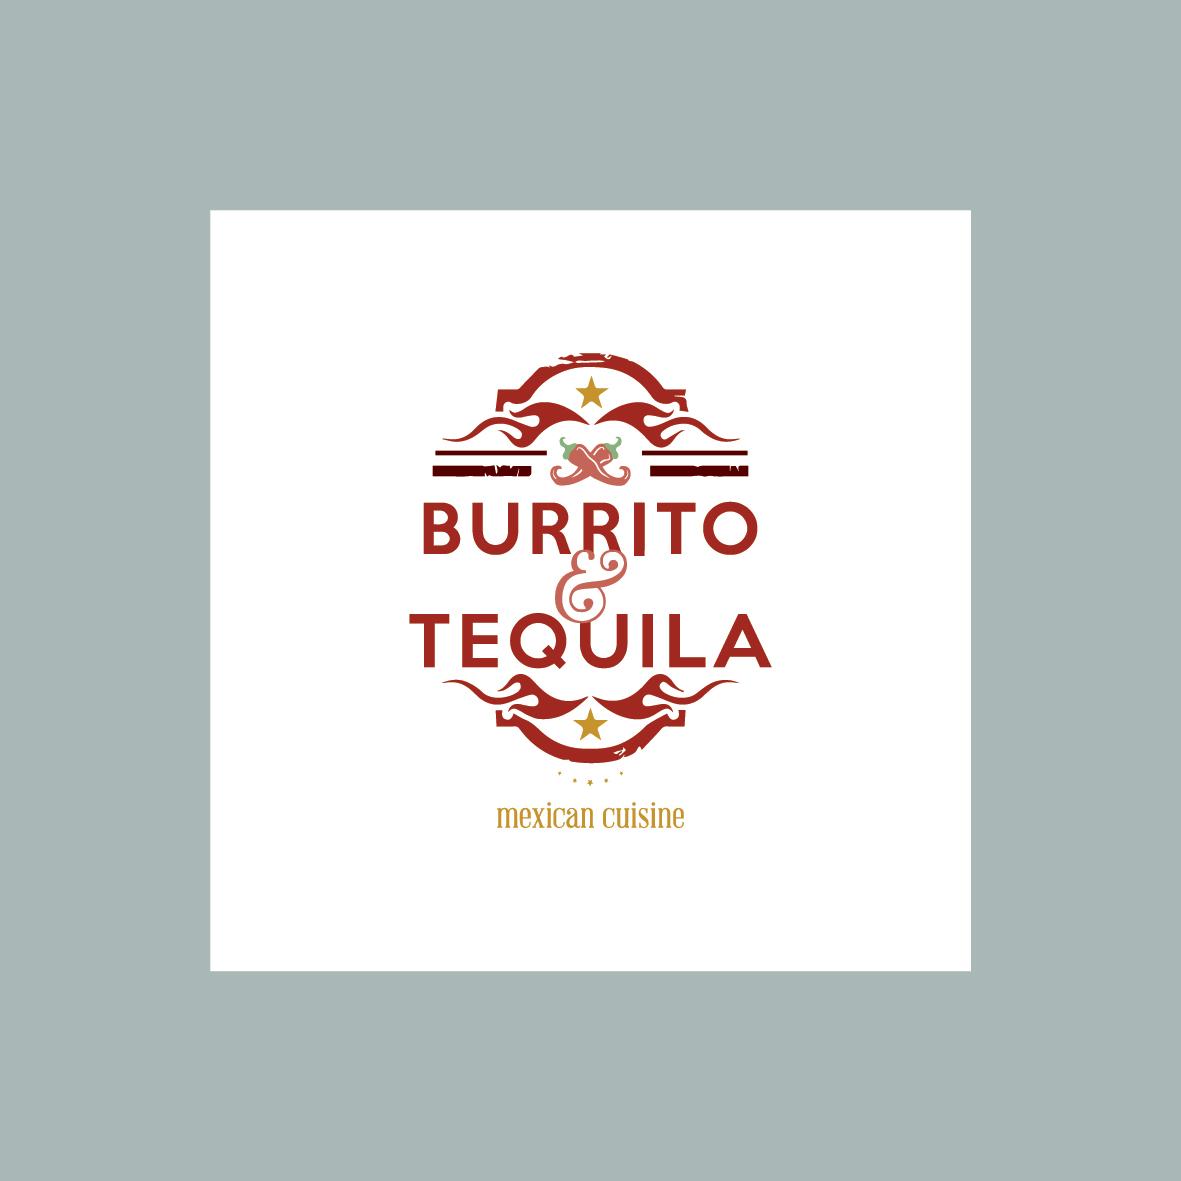 Burrito & Tequila Mexican Cuisine Logo